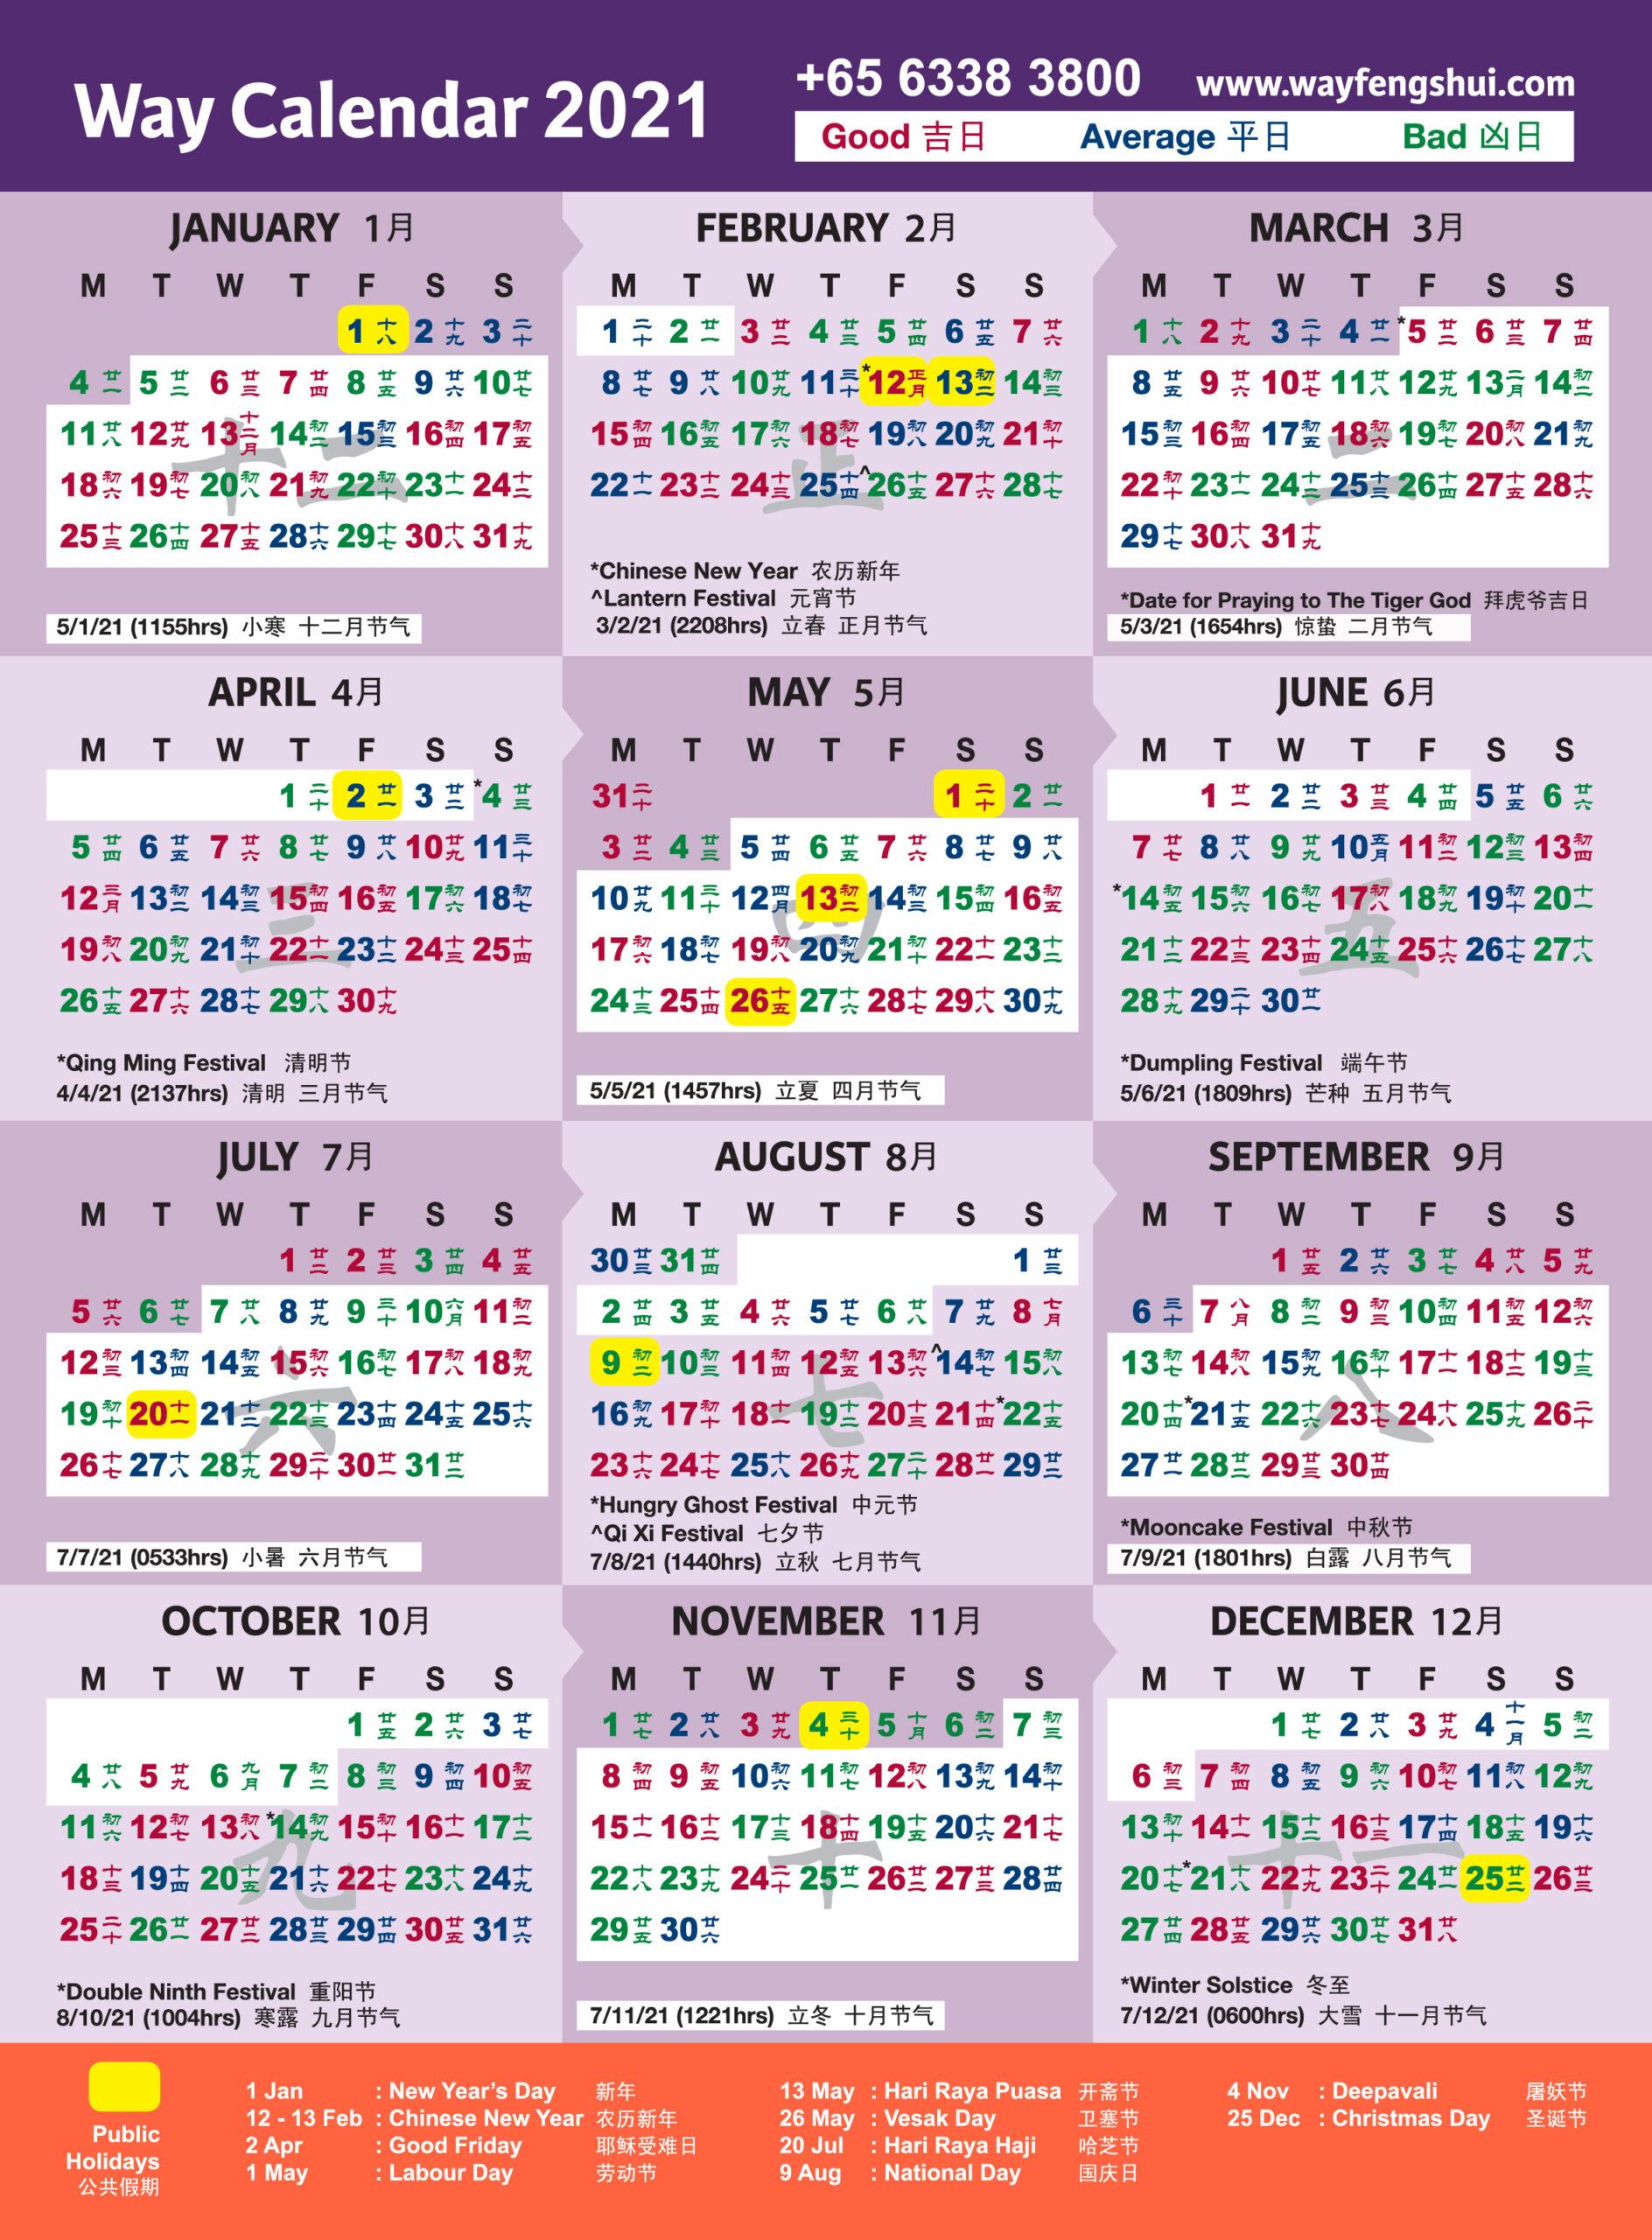 2021 Way Calendar - Feng Shui Master Singapore Chinese